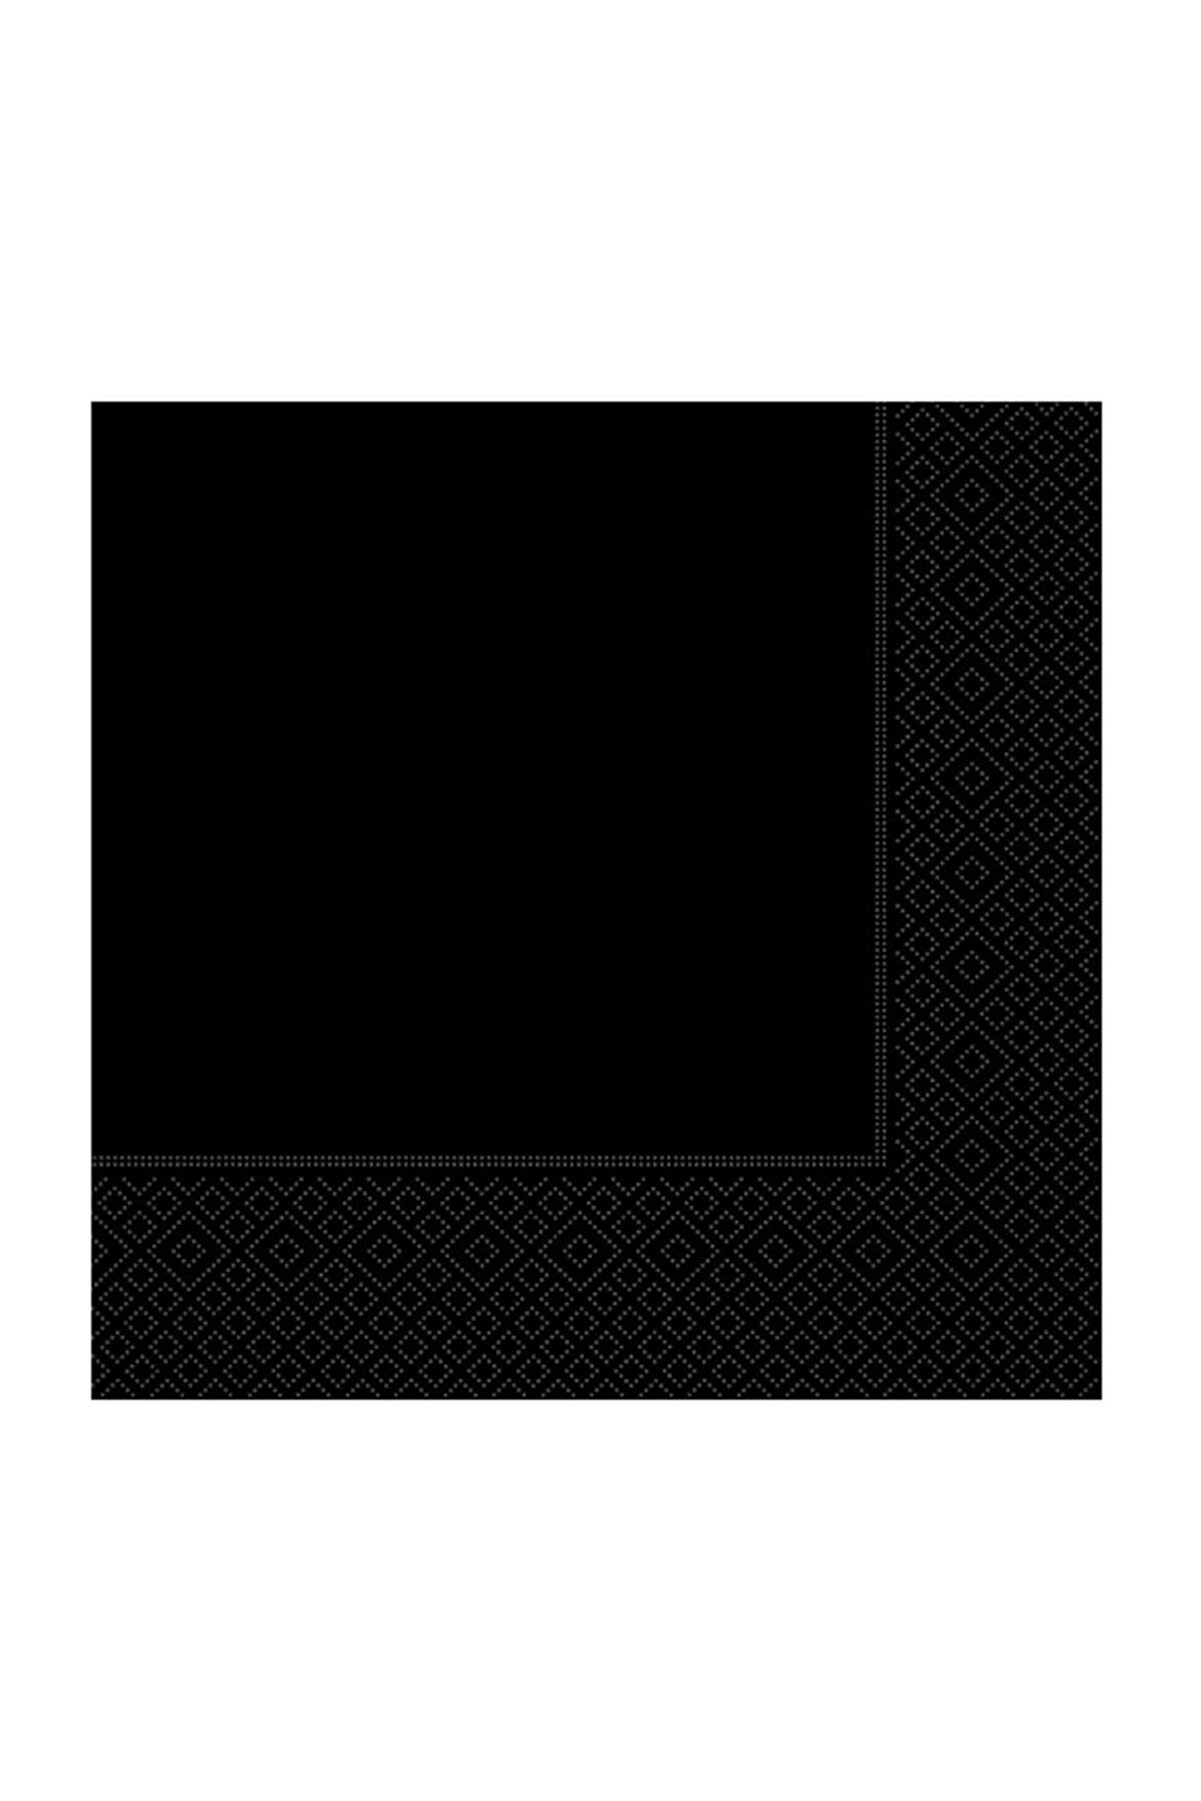 Kikajoy Siyah Kağıt Peçete 33x33 cm 20'li